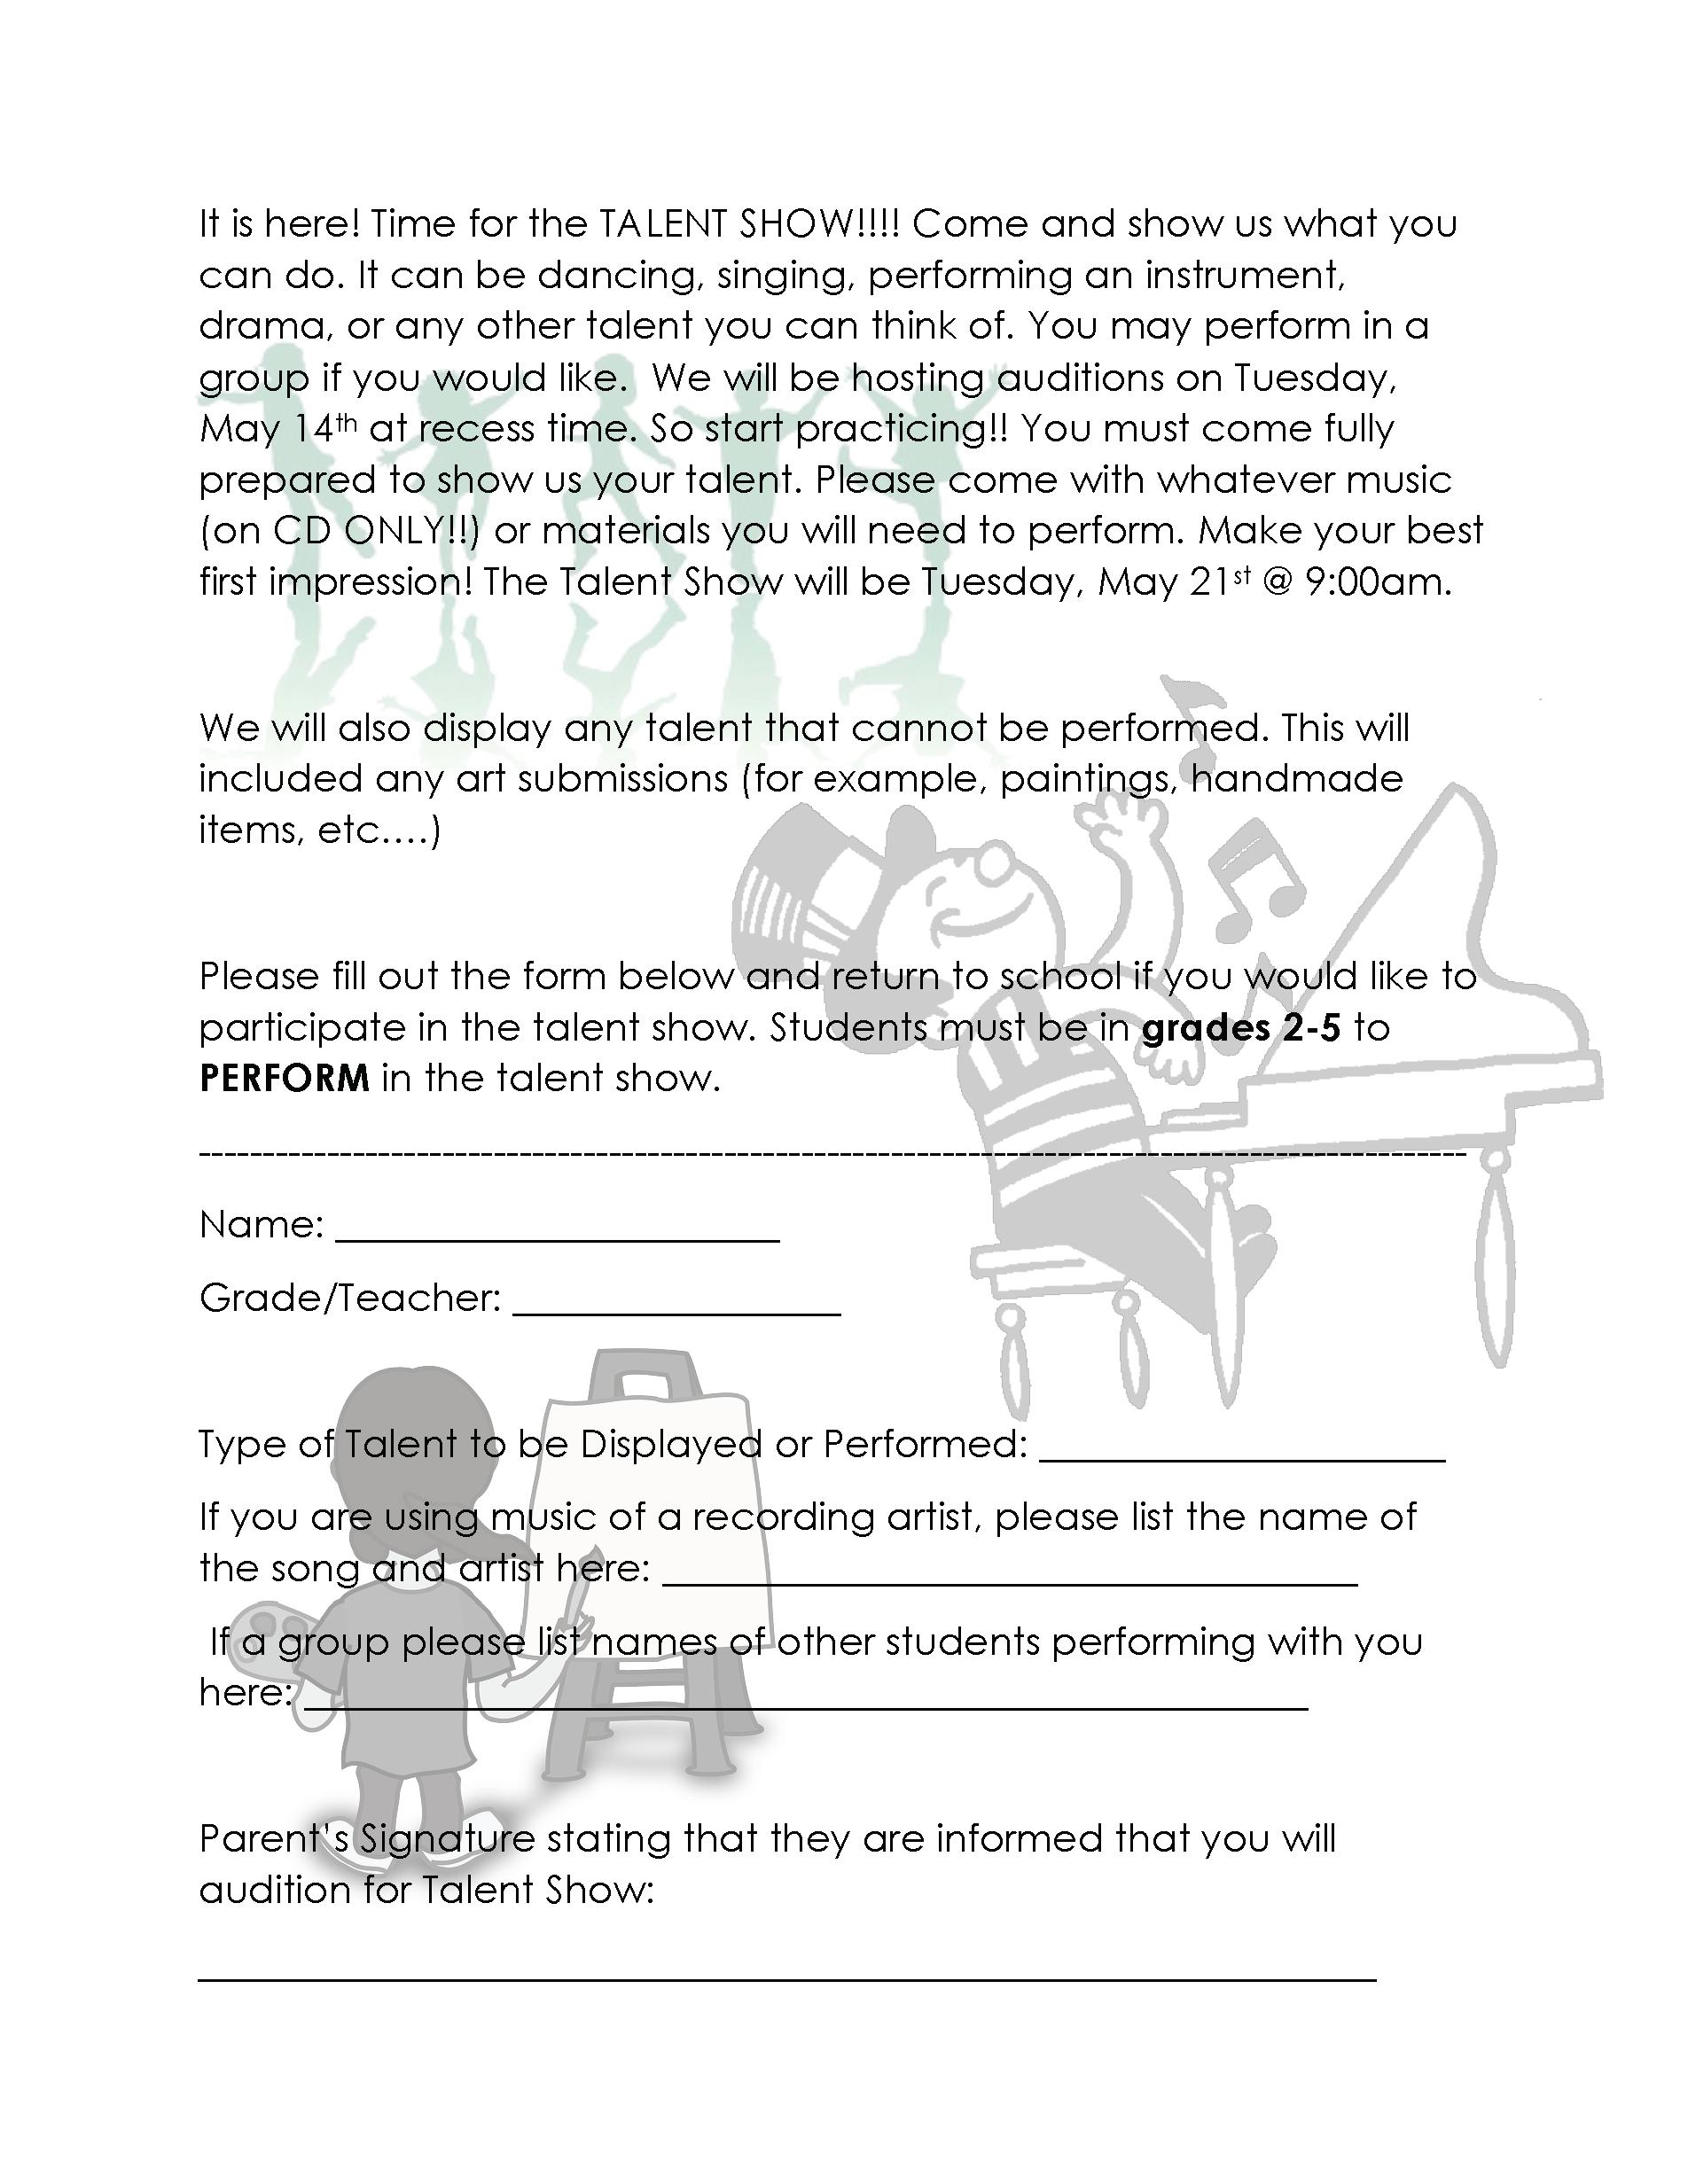 talent-show-informational-sheet.png